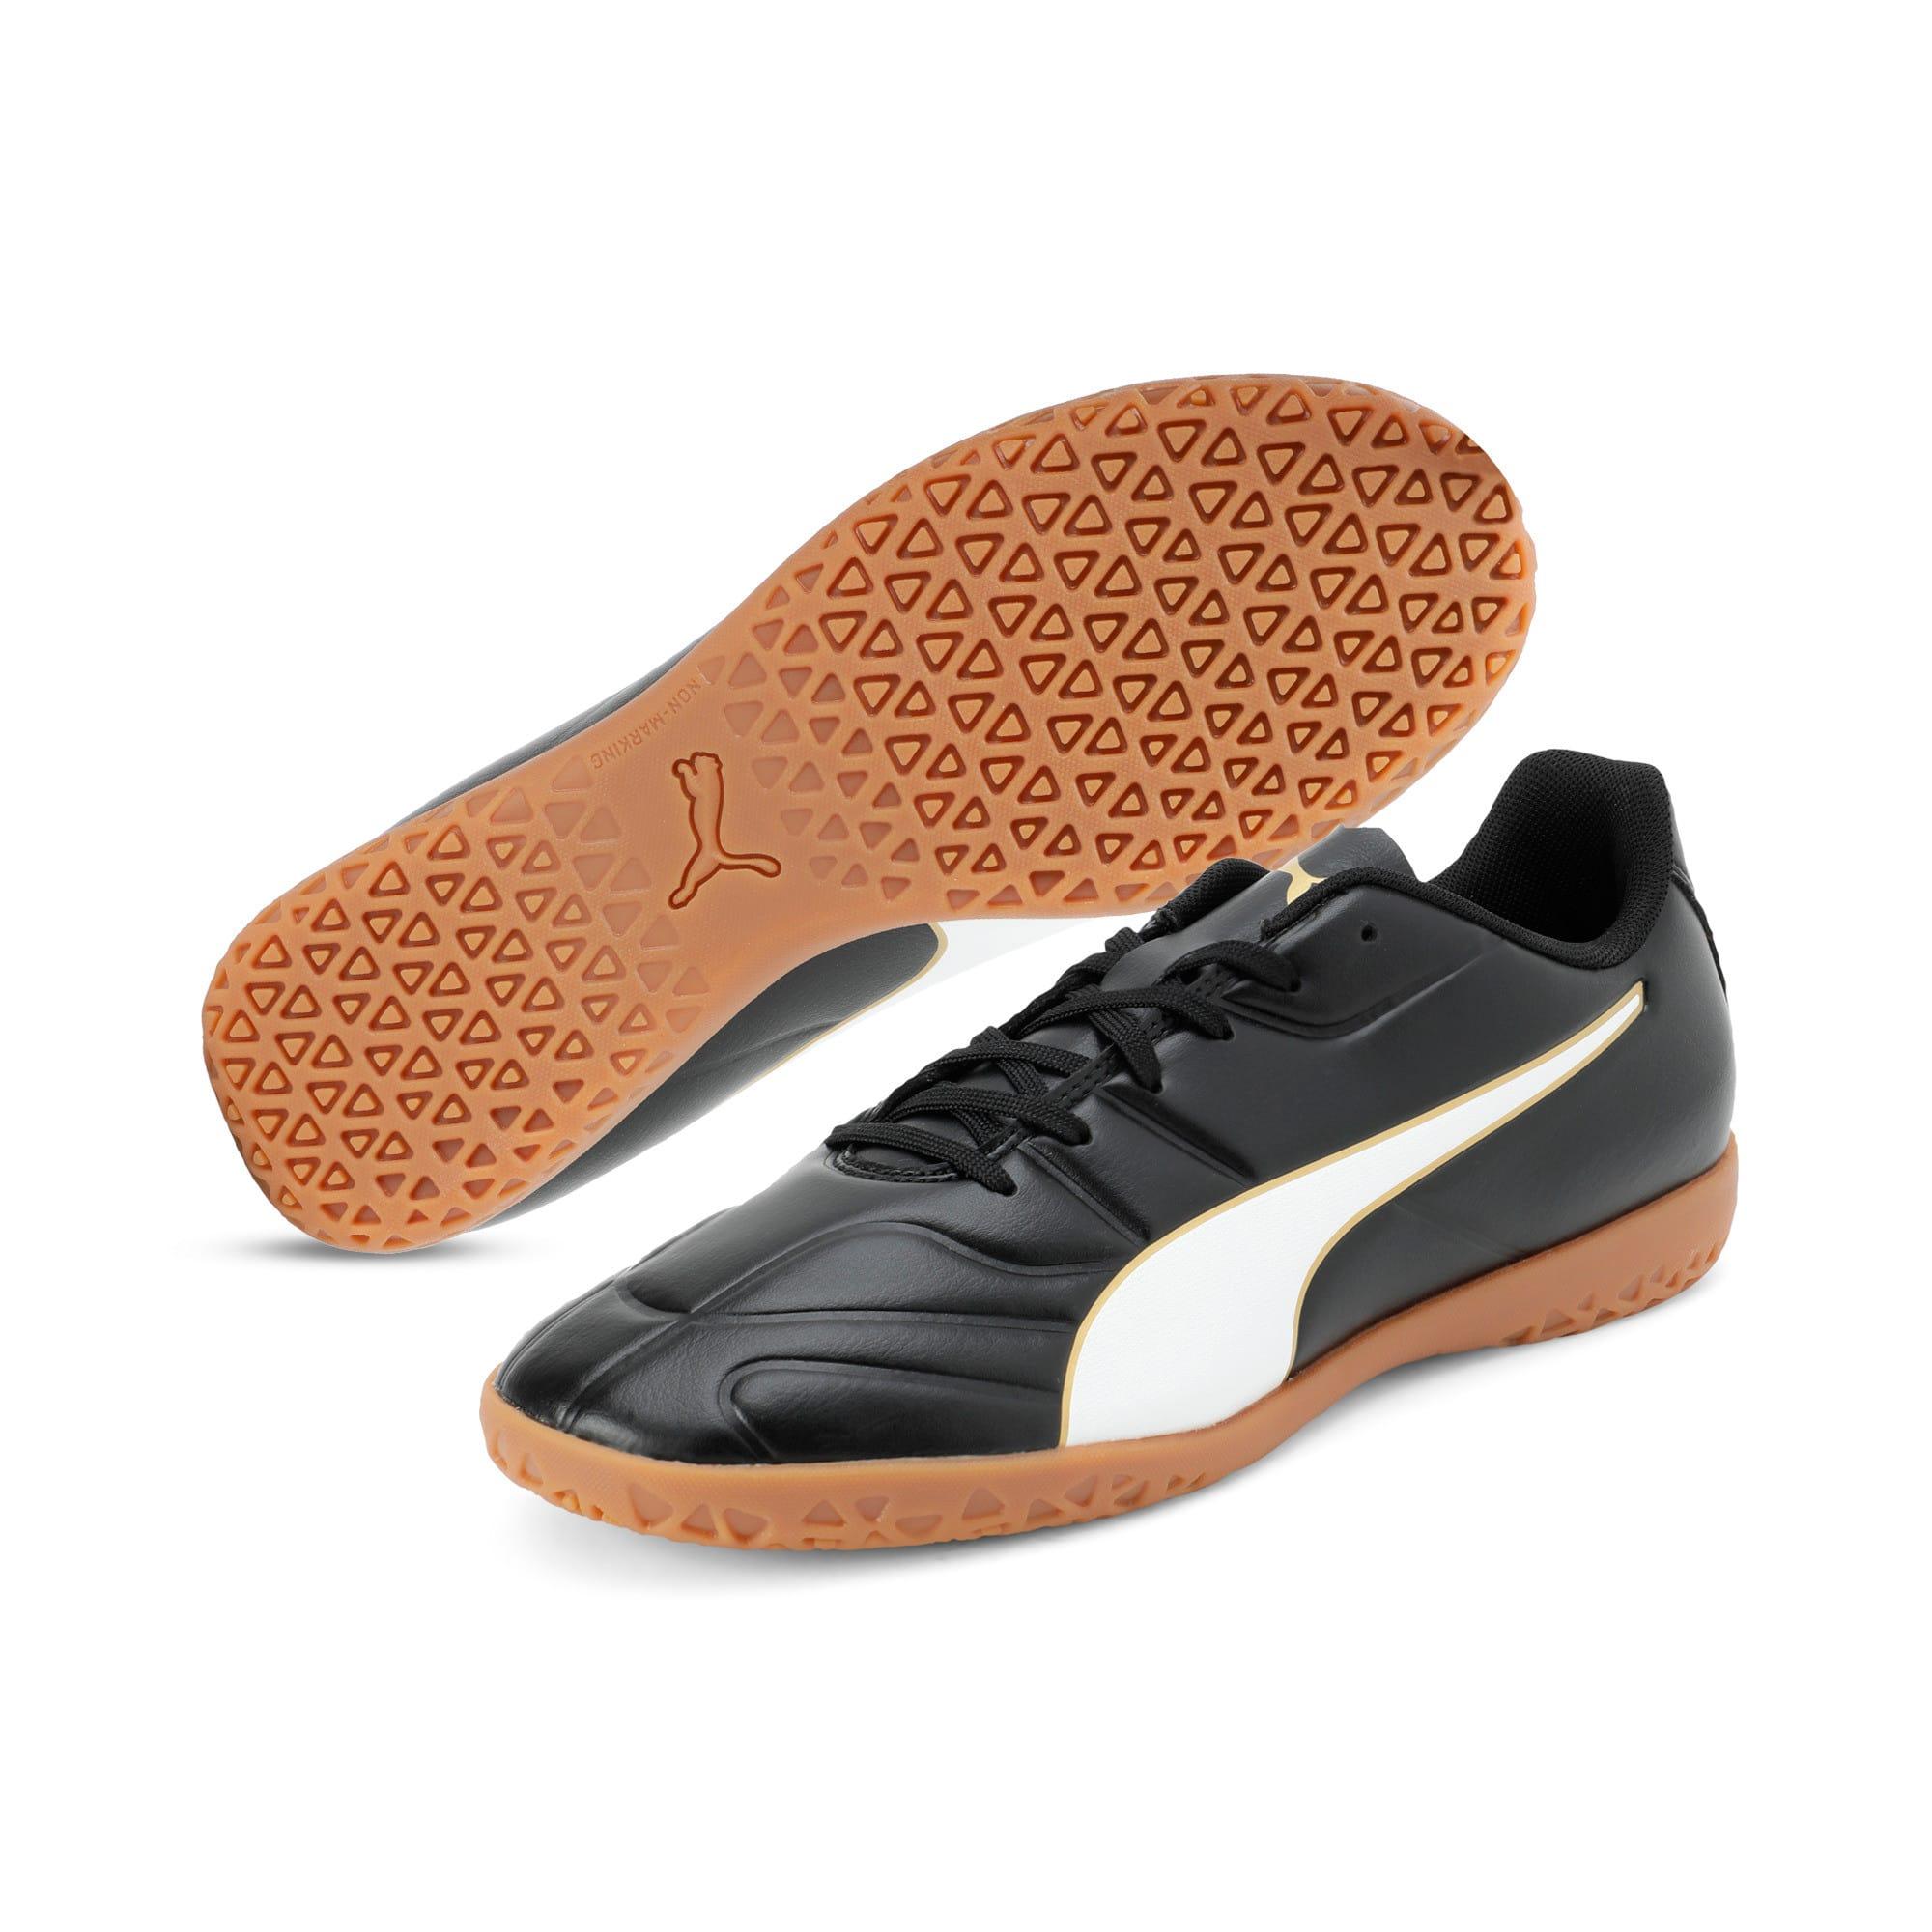 Thumbnail 6 of Classico C II Men's Football Boots, Puma Black-Puma White-Gold, medium-IND